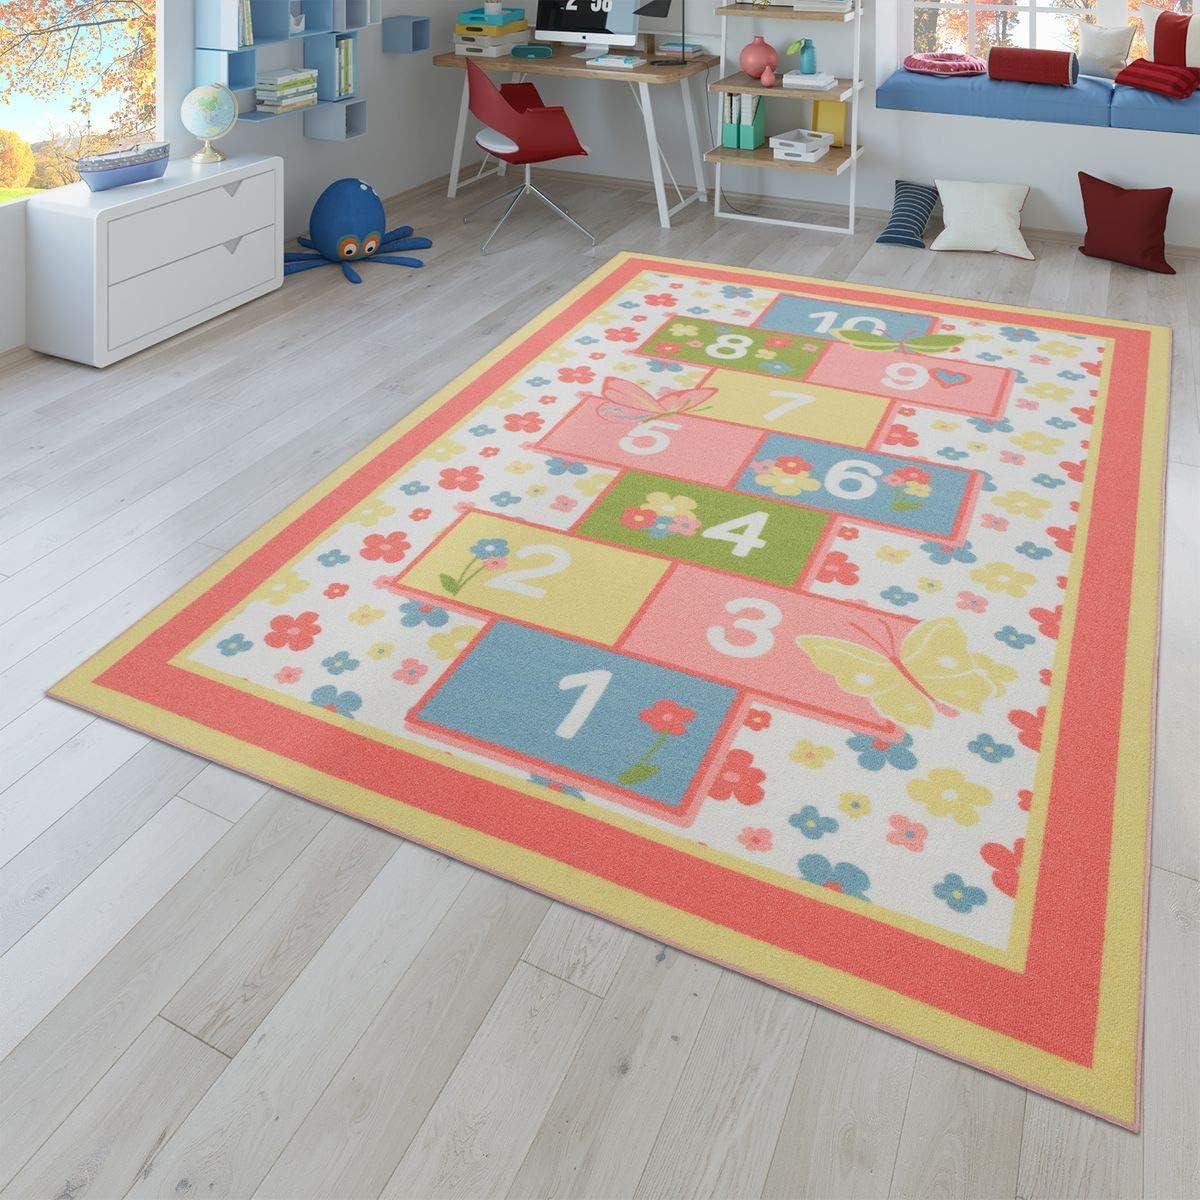 Color Rosa y Blanco 80 x 150 cm dise/ño de Corona con Texto en alem/án TT Home Alfombra para habitaci/ón Infantil Lavable